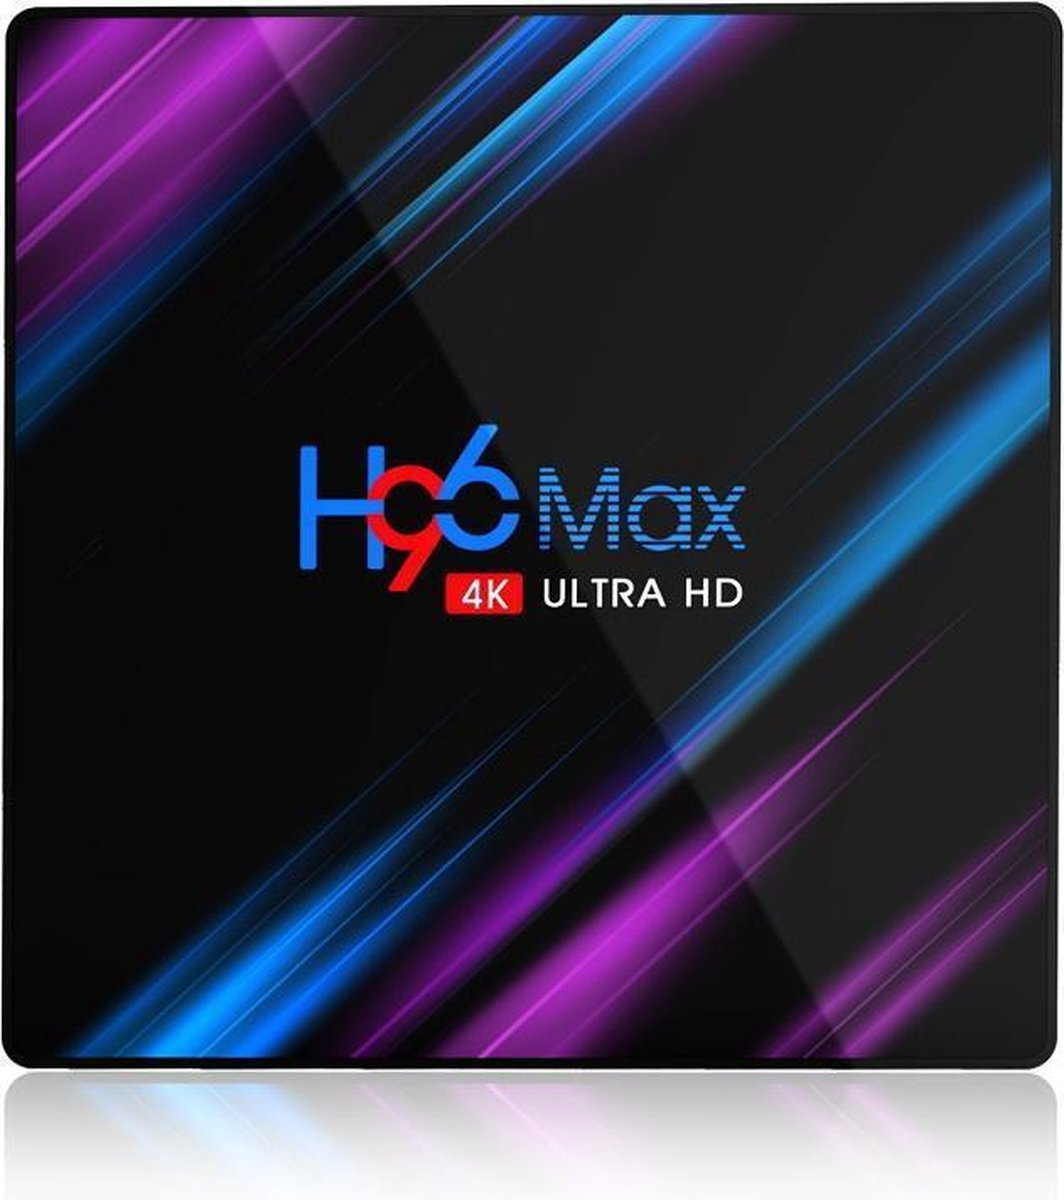 H96 Max 4K Ultra HD, 2/16GB, Android 10, media TV streaming box